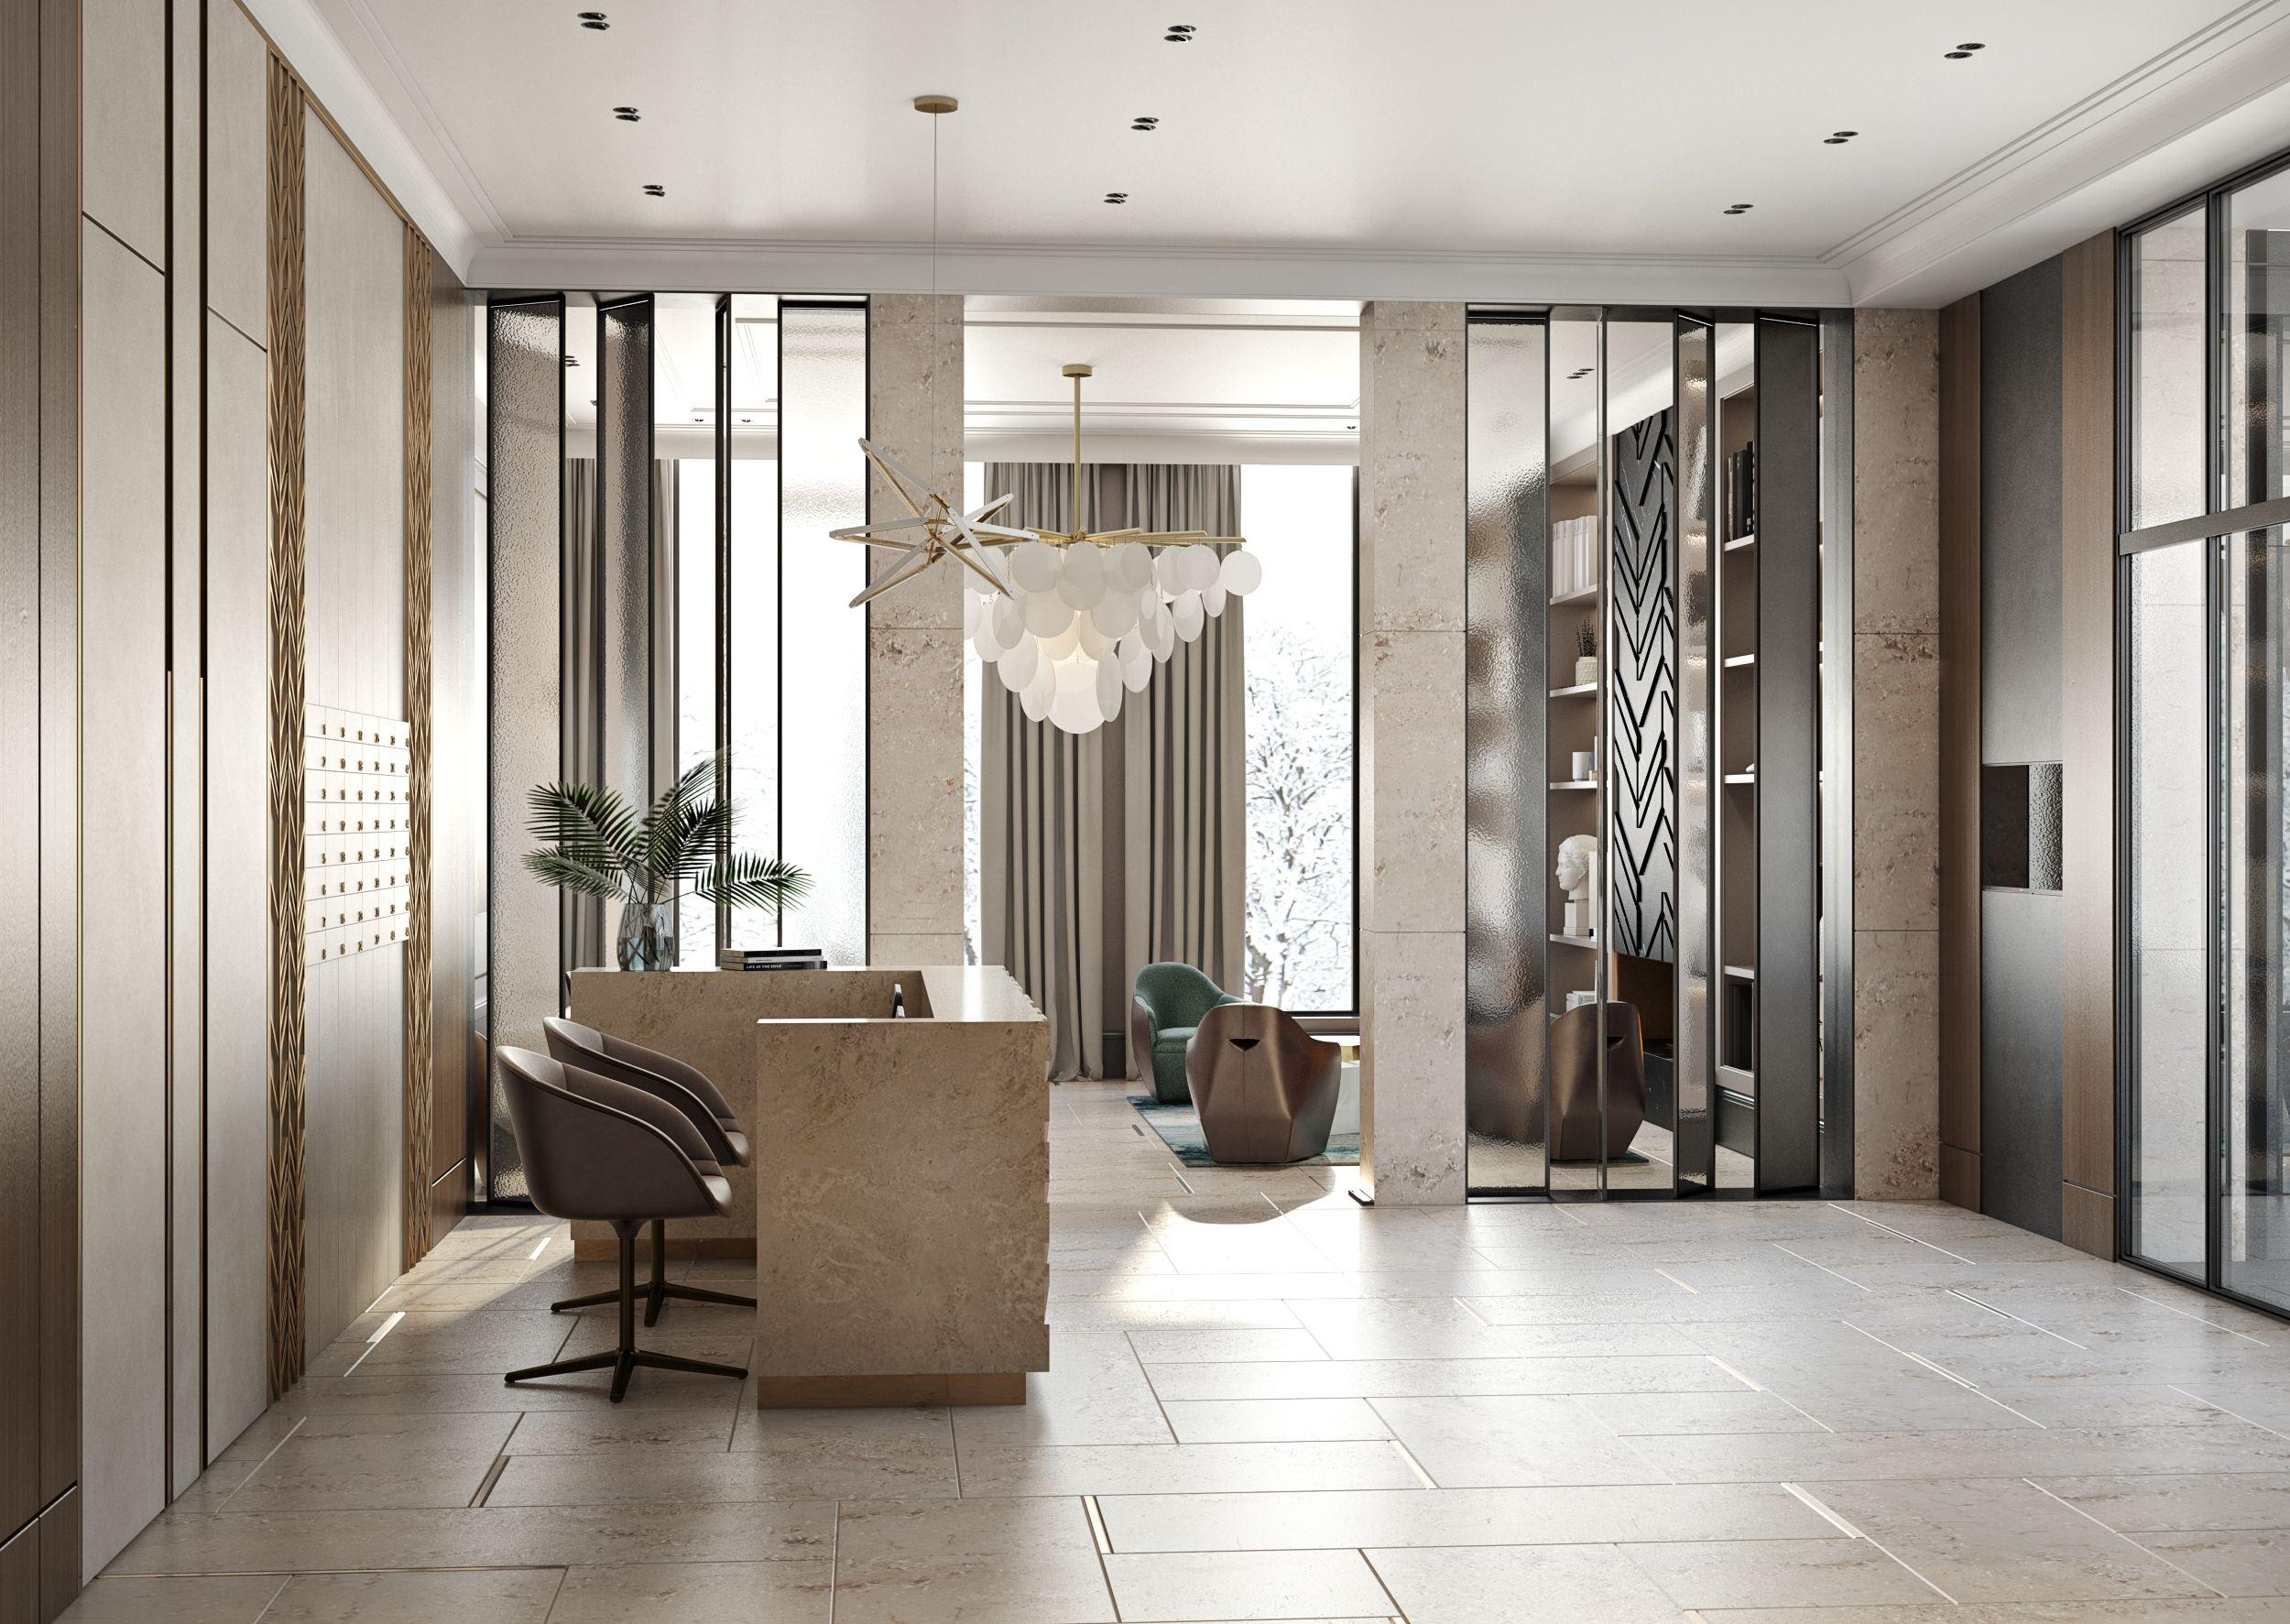 Nice #architecture #Interior #Interiordesign #Studio211 #Bard5 #house  #TheMostman #Mostman